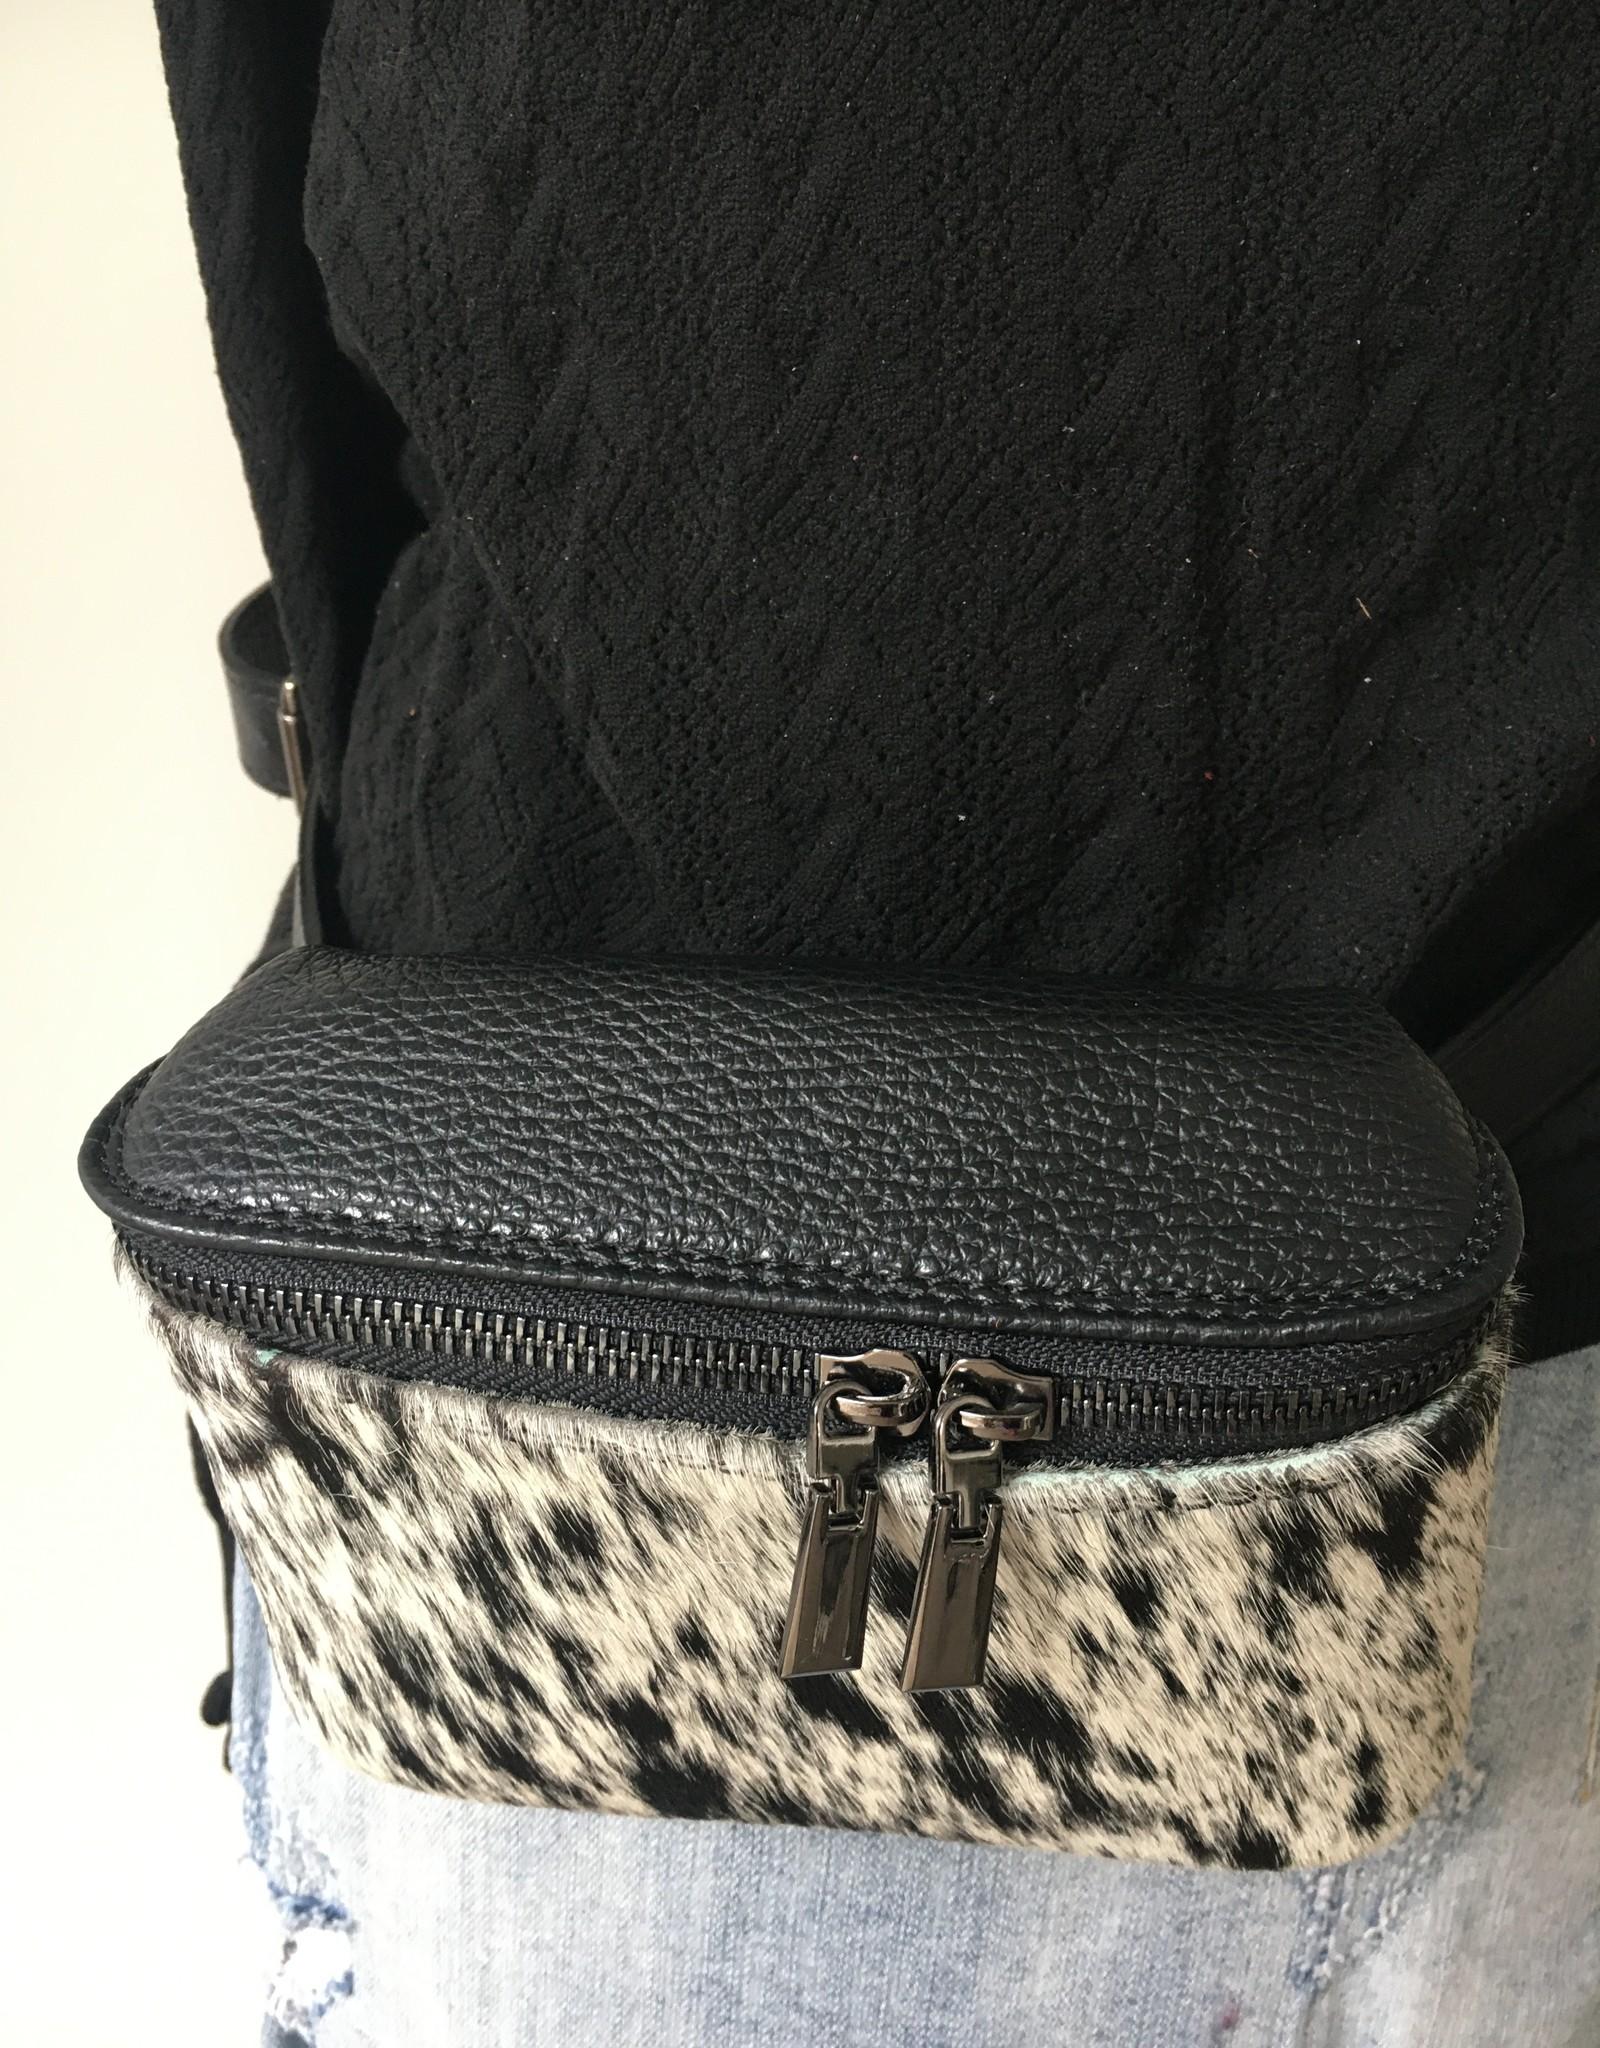 Hip bag in furry black/white print